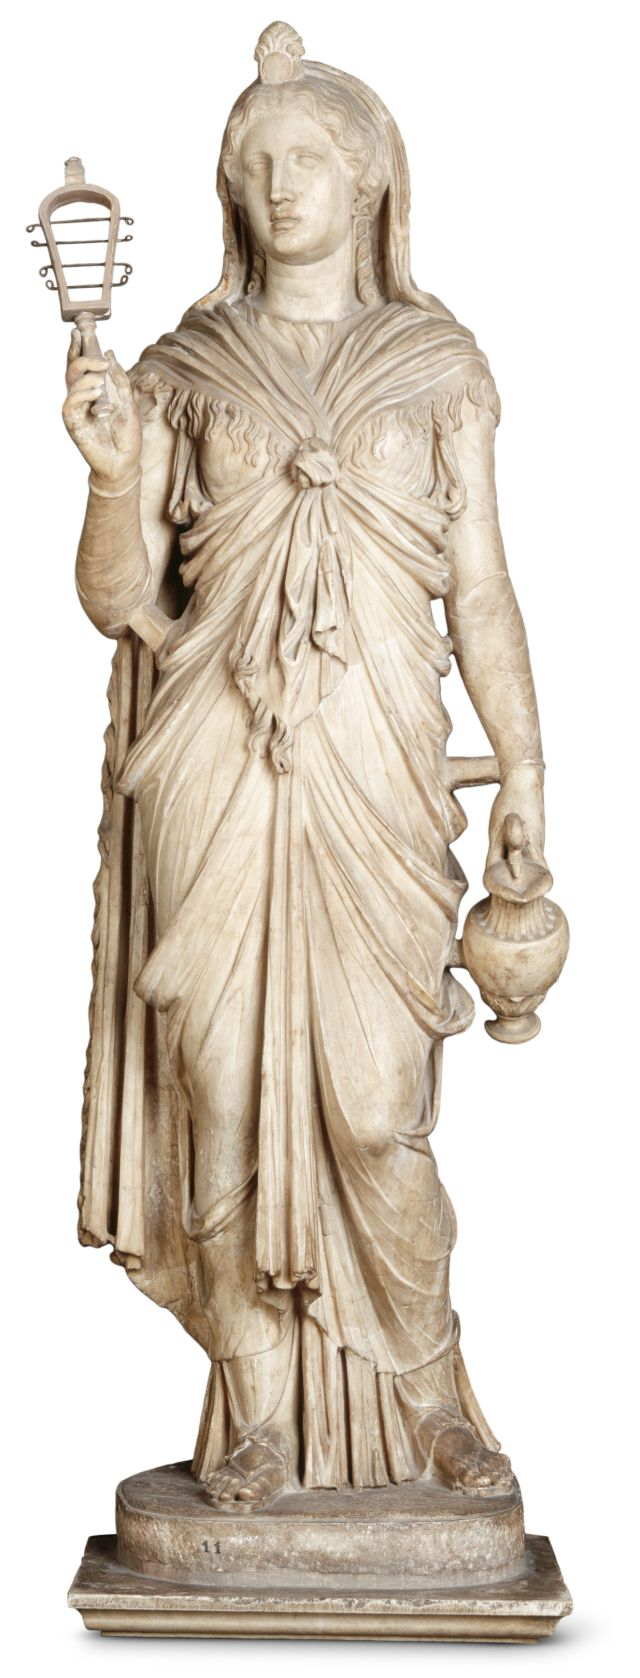 Romanian Gods And Goddesses